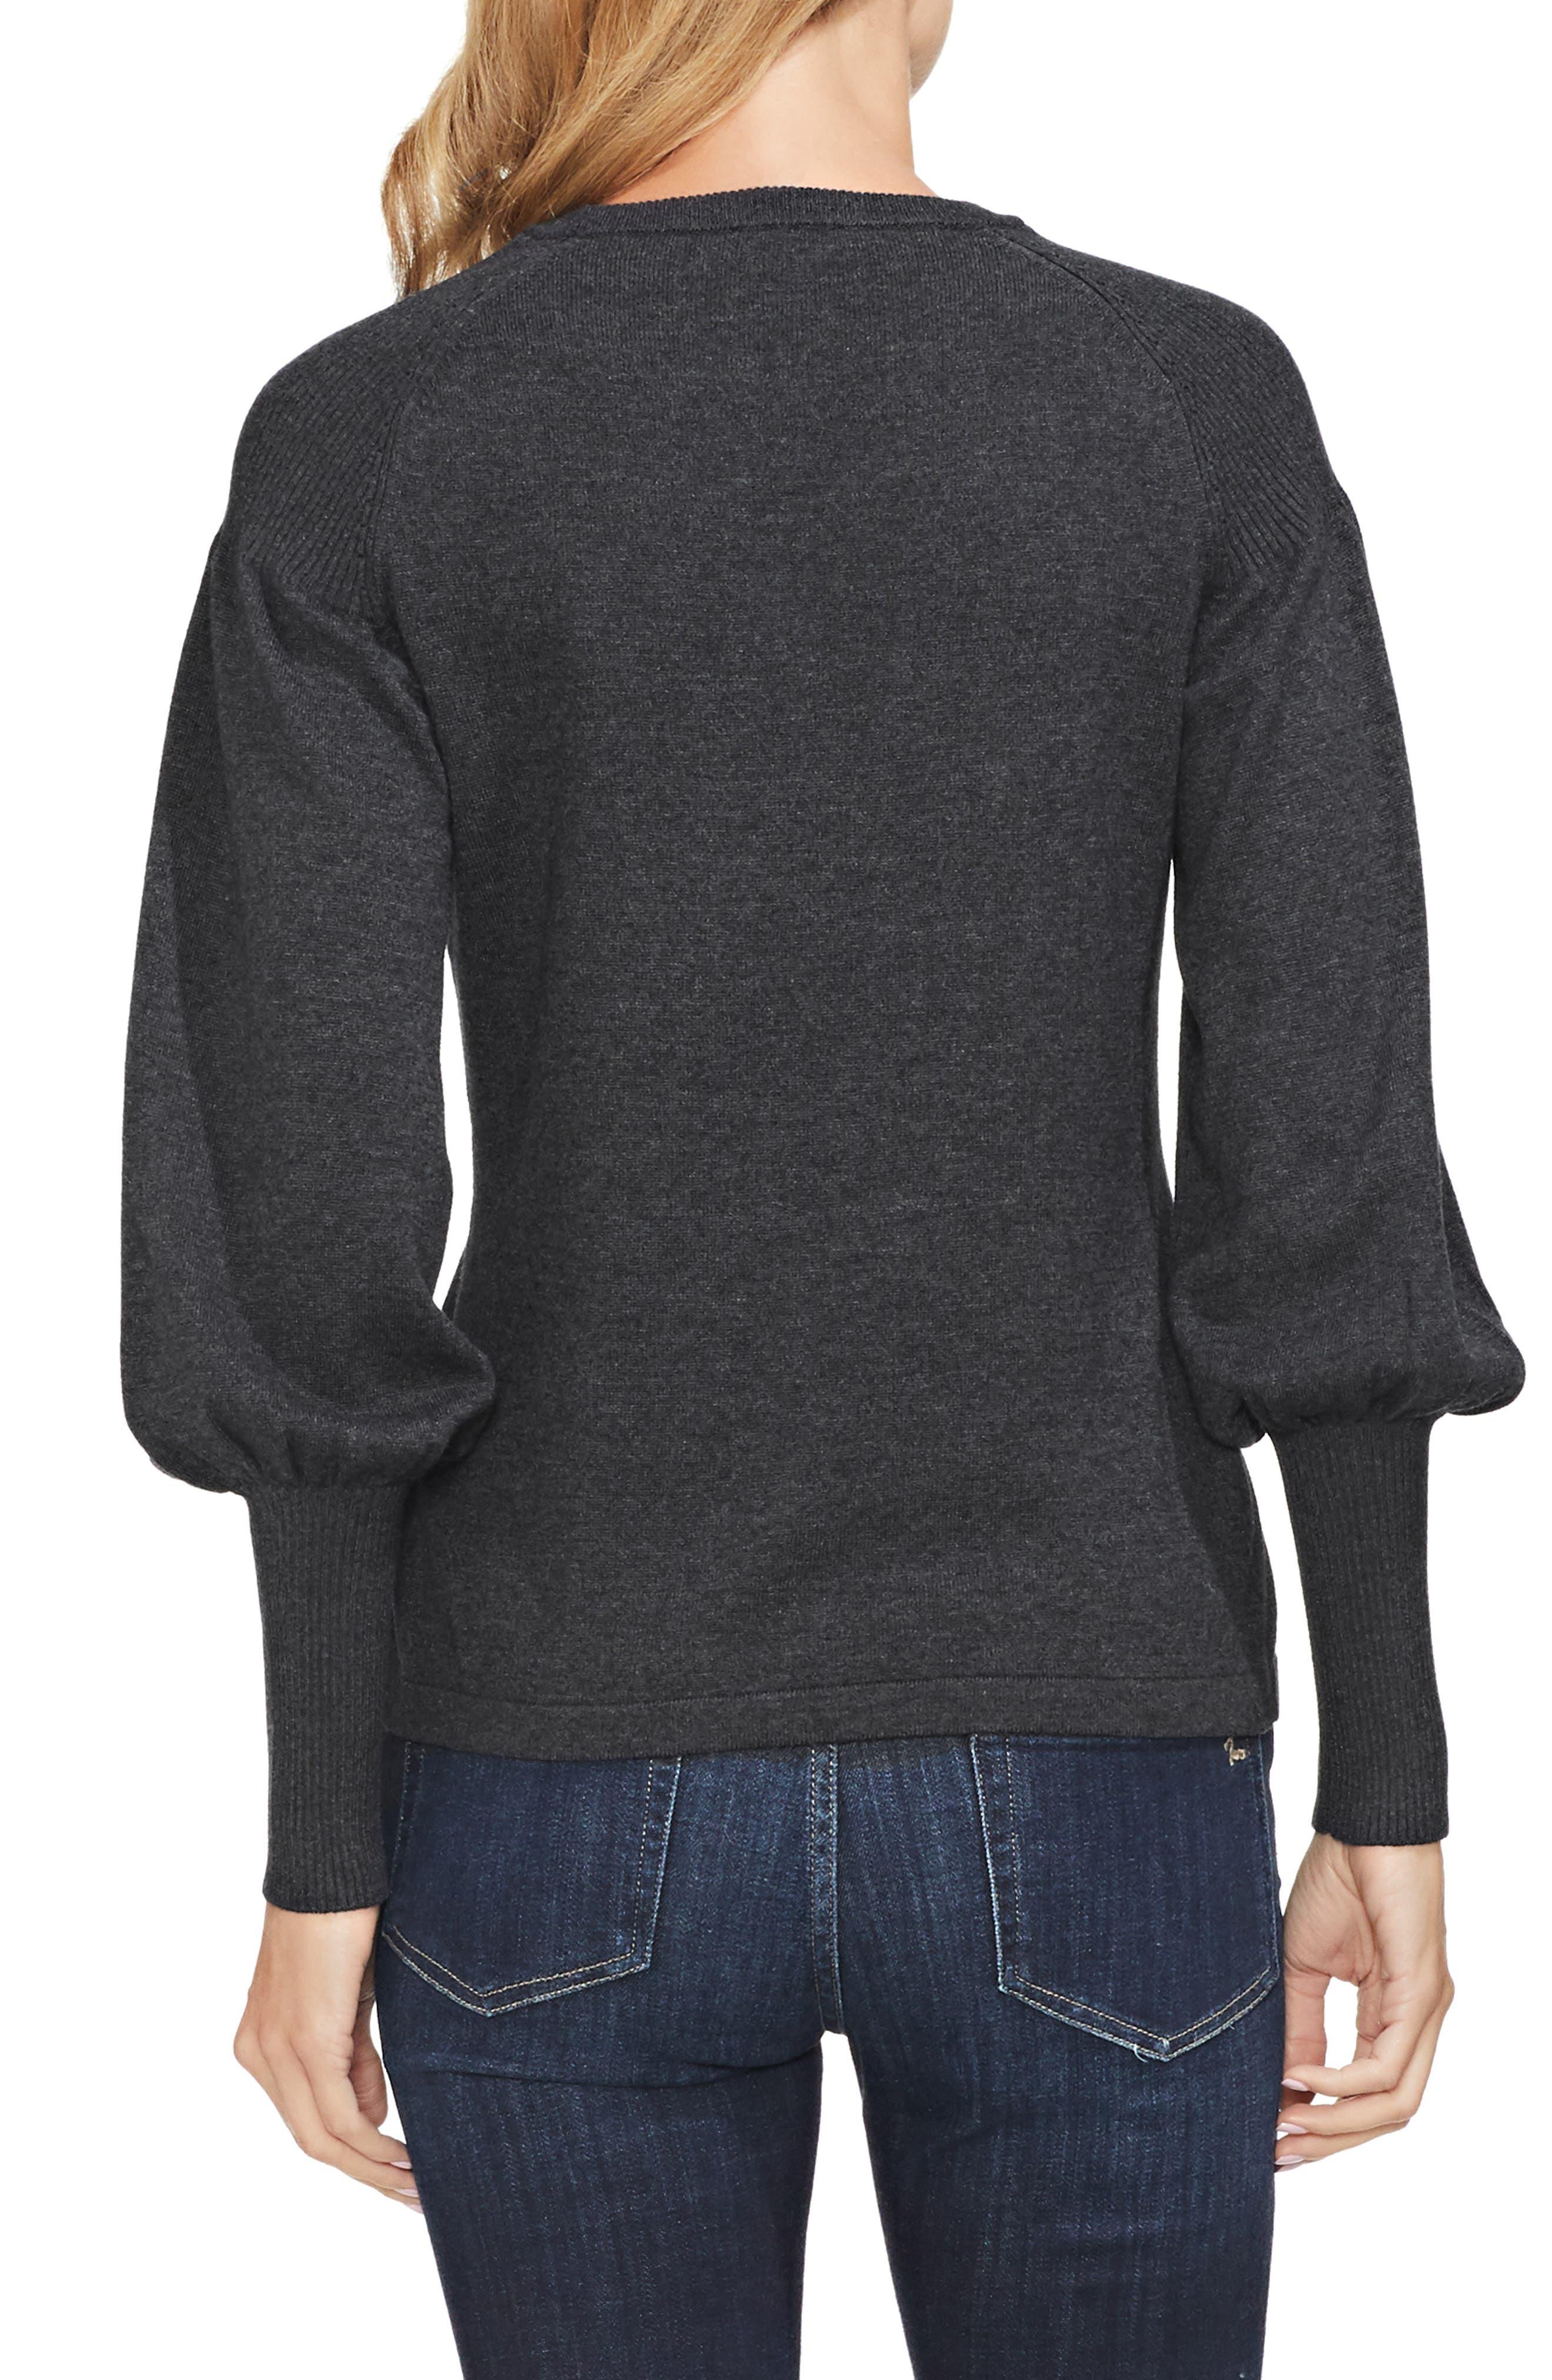 Blouson Sleeve Sweater,                             Alternate thumbnail 3, color,                             MED HEATHER GREY